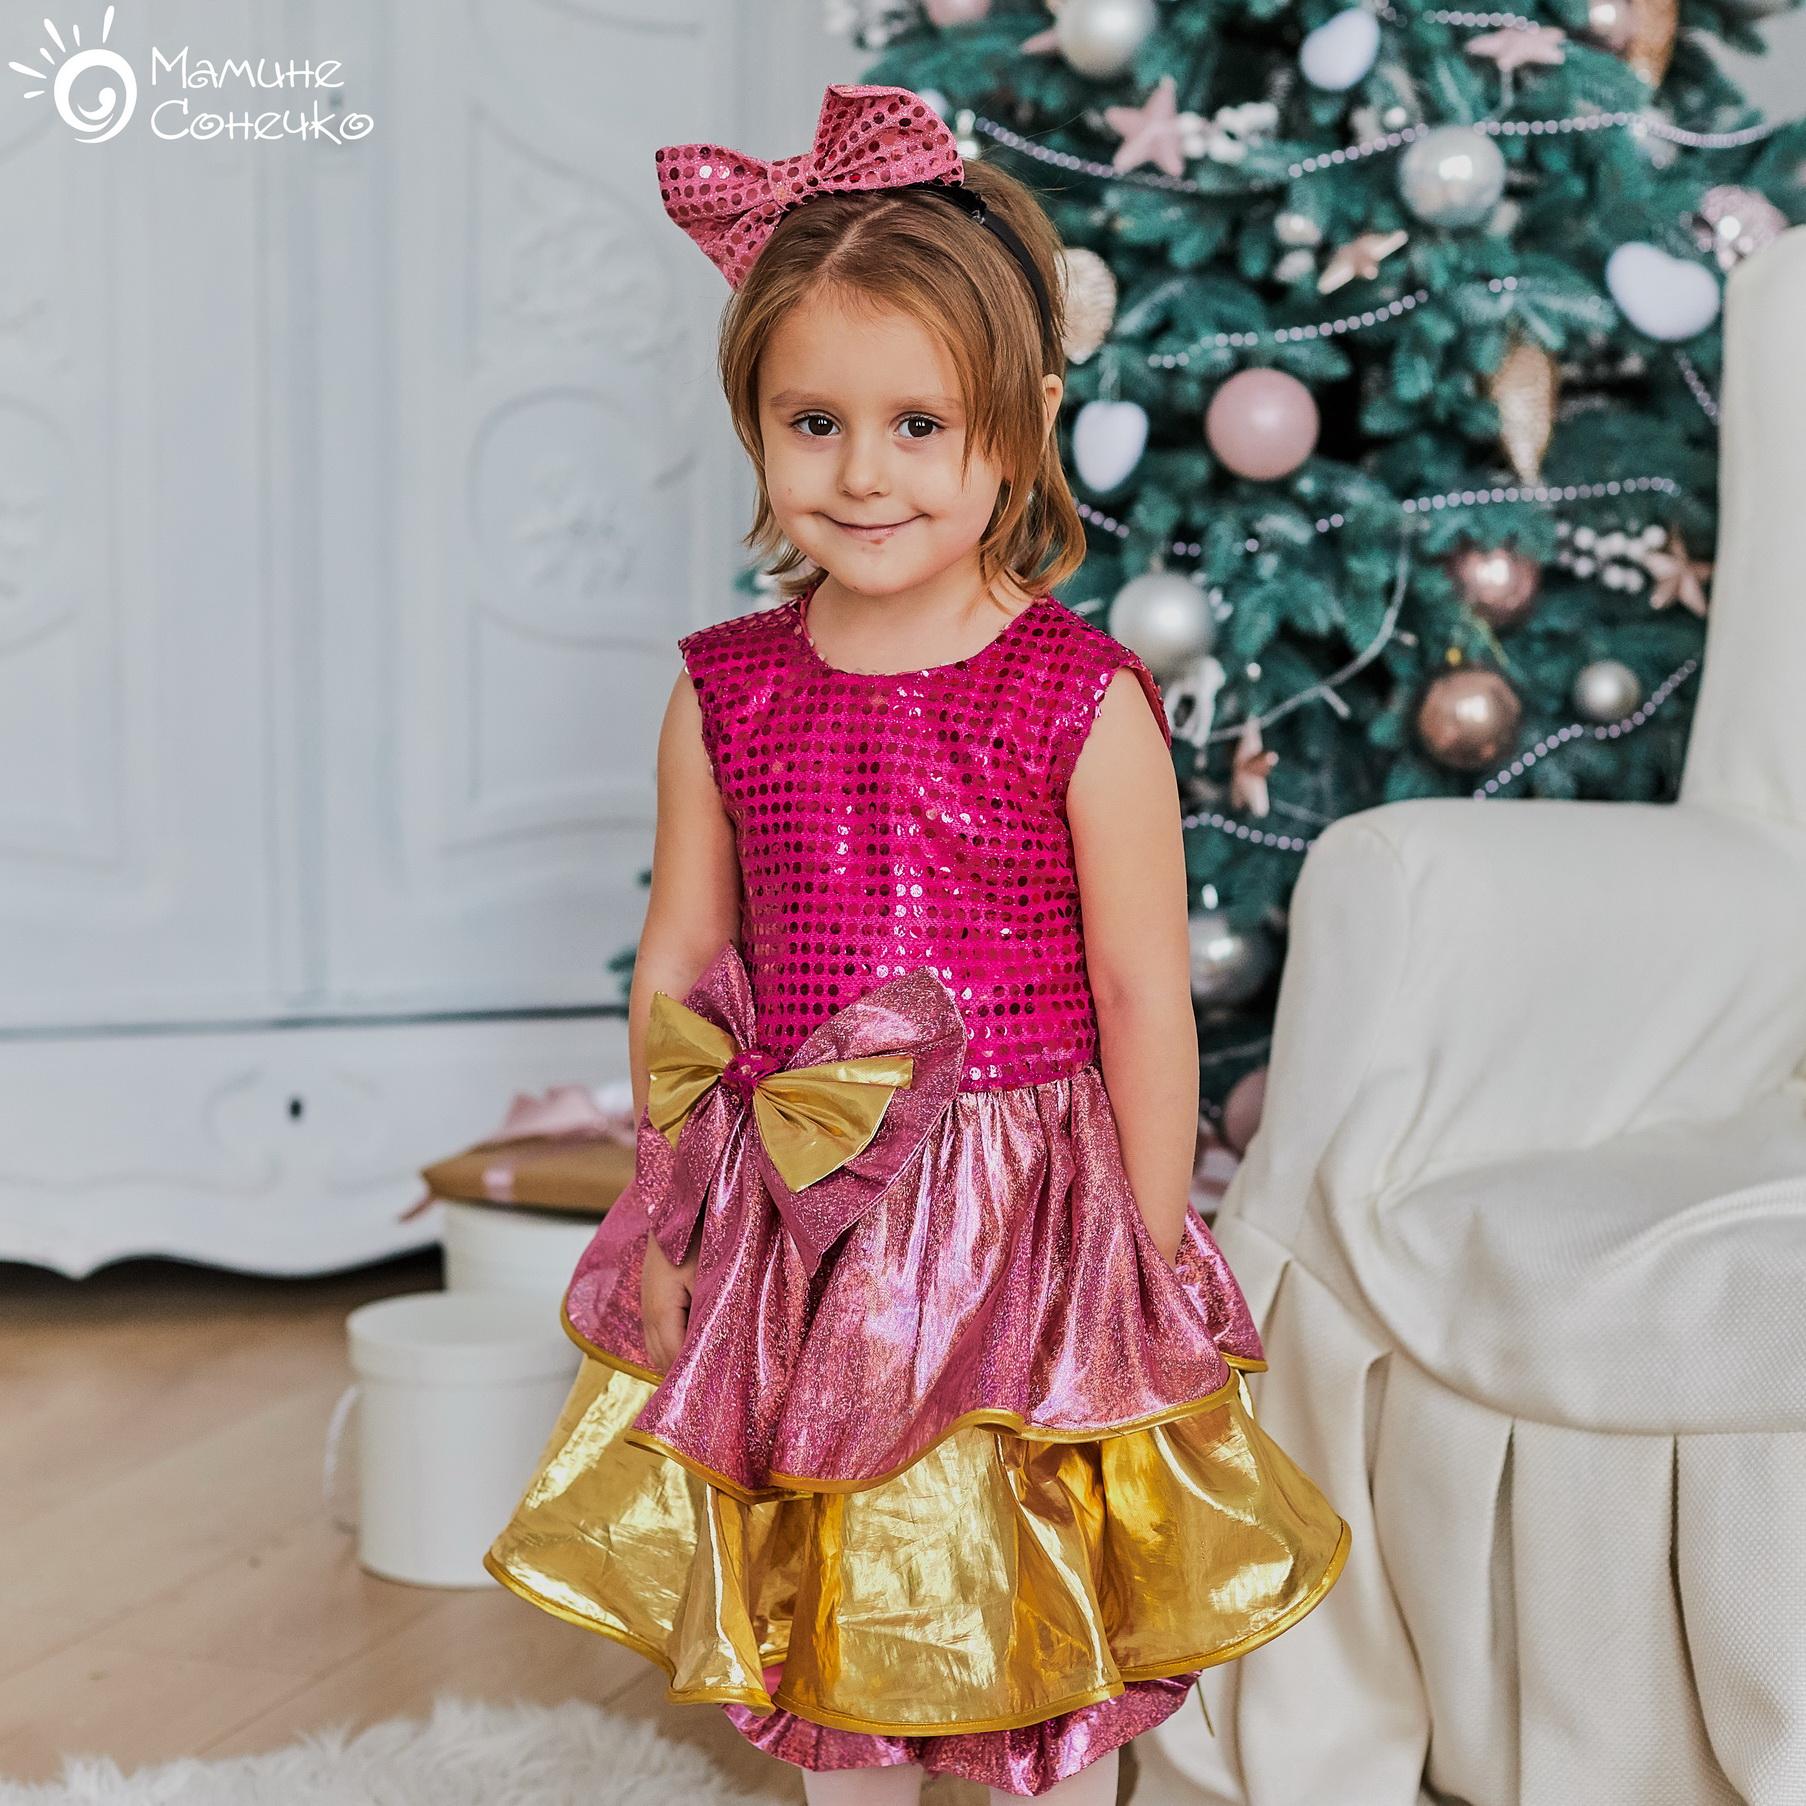 kostium-tsukerochka-malynovo-zolota-4